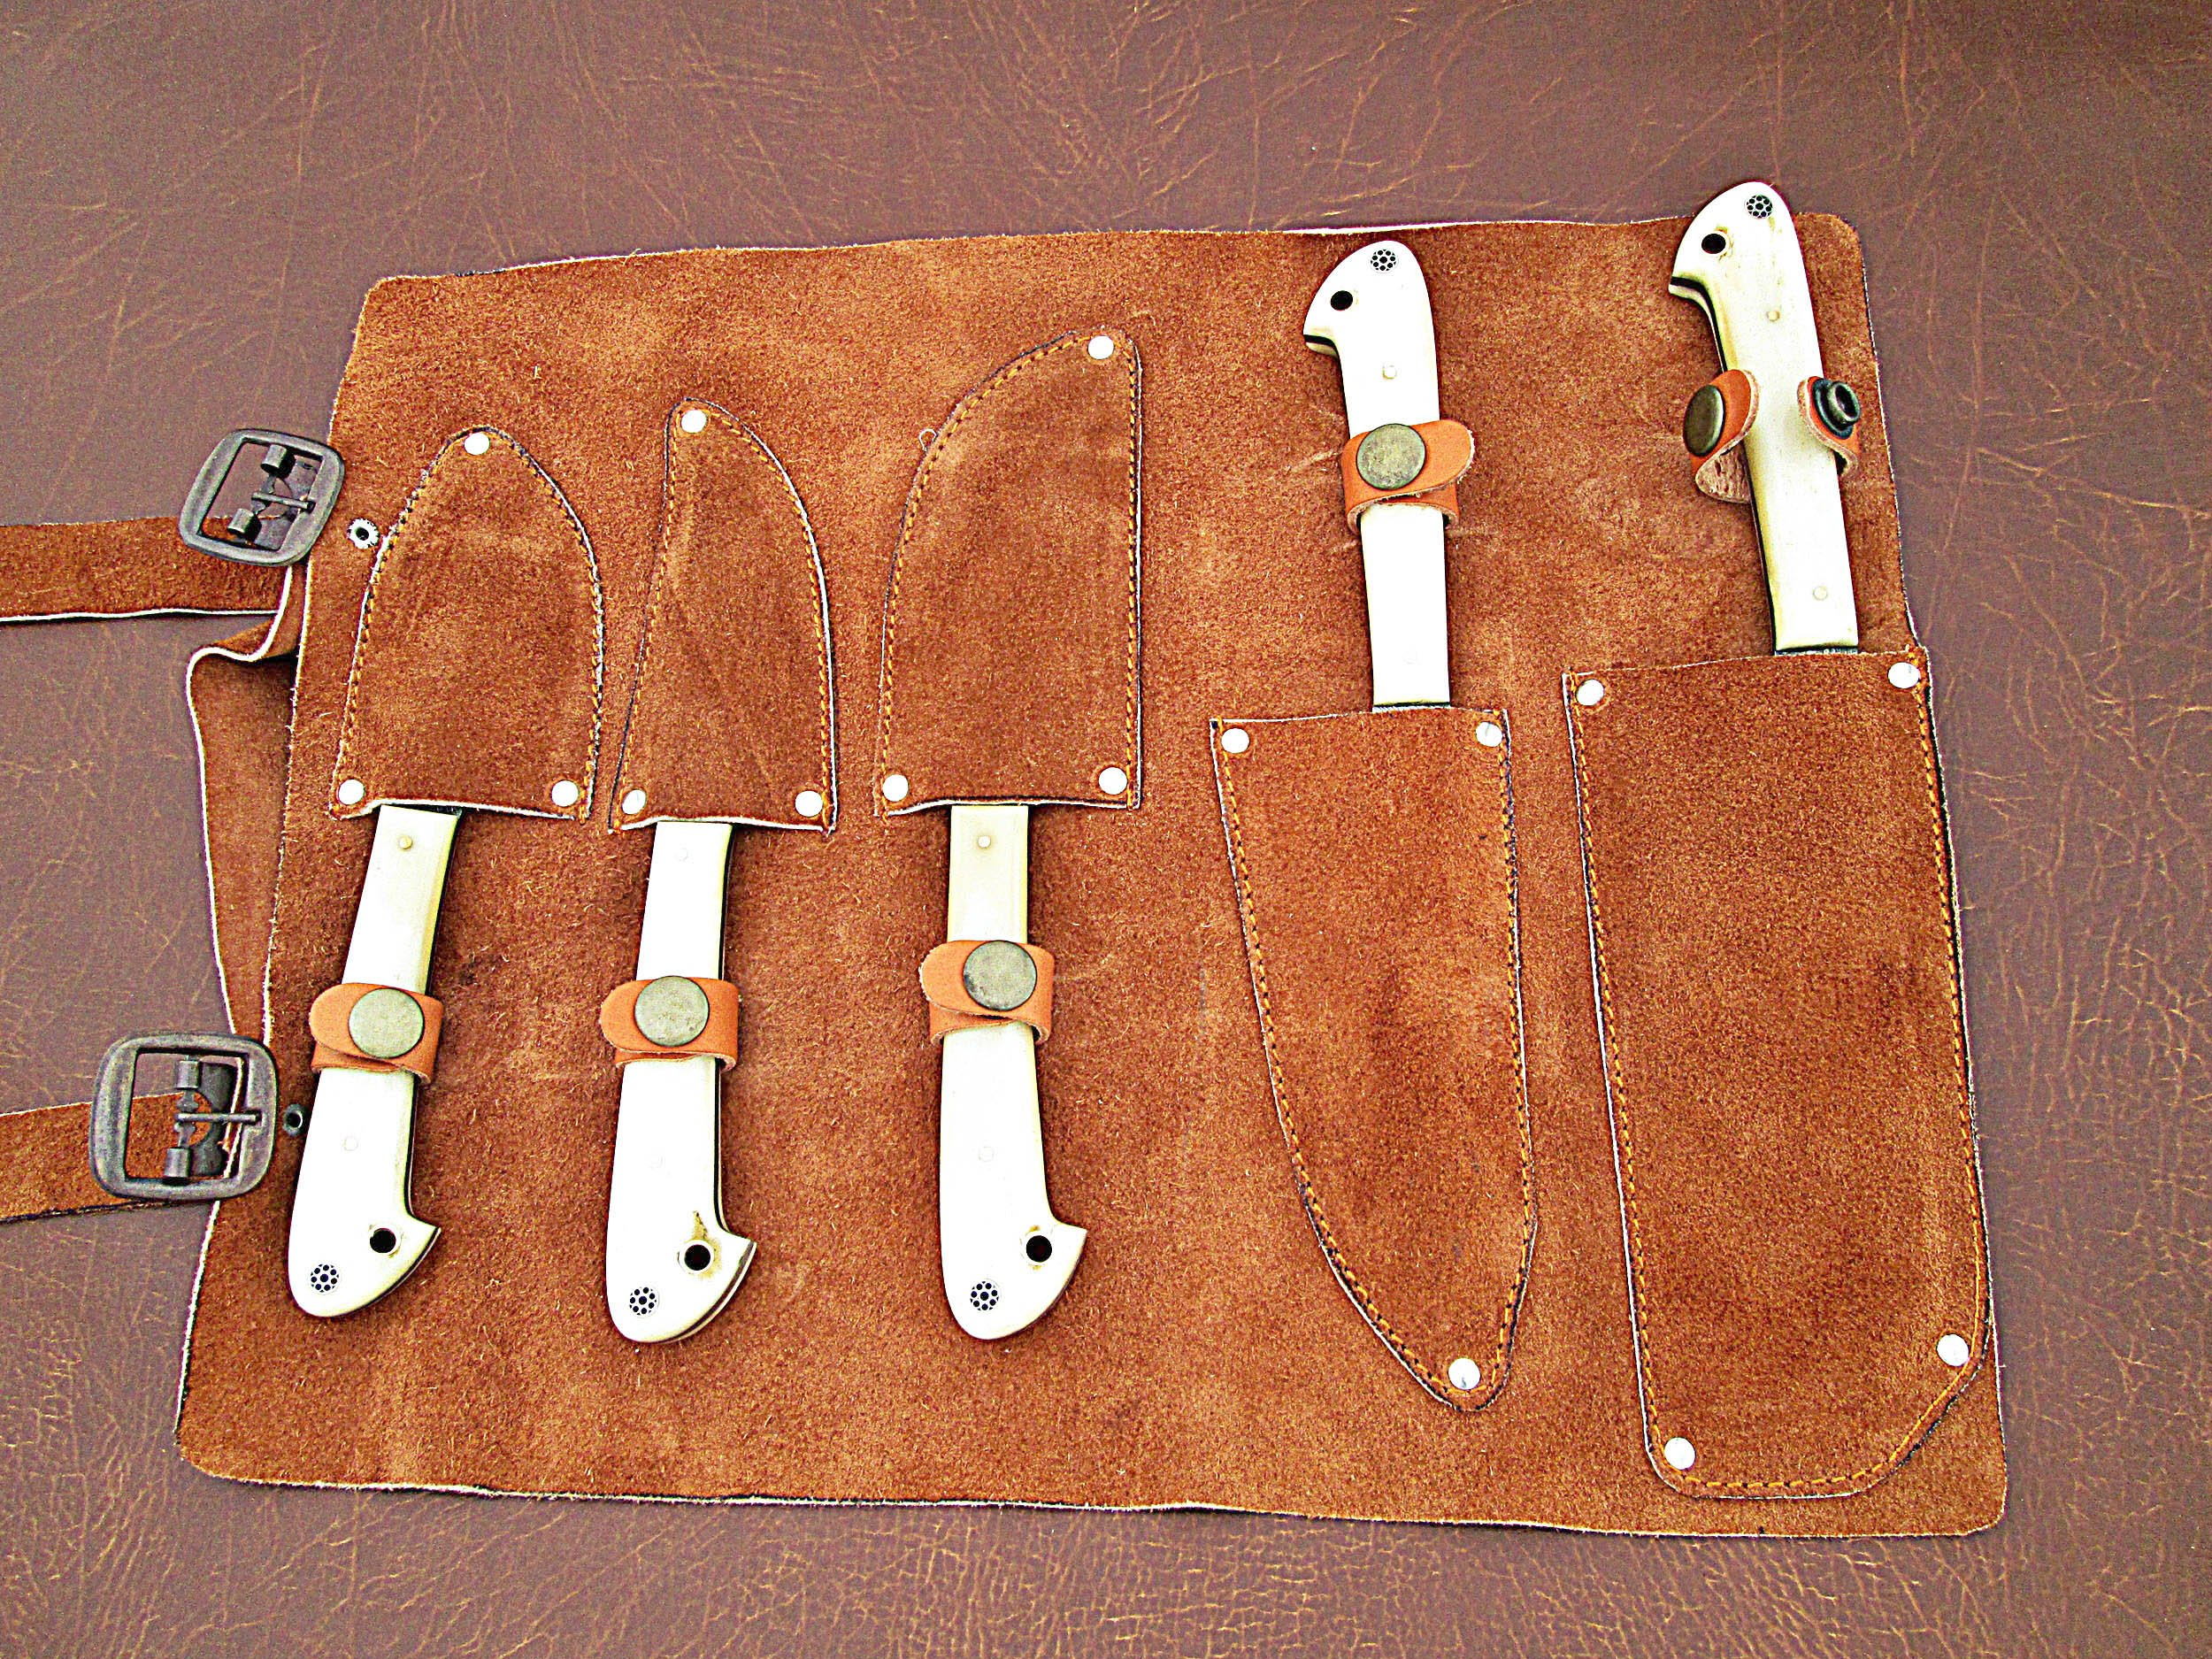 Christmas Gift Offer By ColdLand | Custom Handmade Damascus Steel Splendid Kitchen Set Knives Lot of 5 KSLOT2 by ColdLand Knives (Image #8)